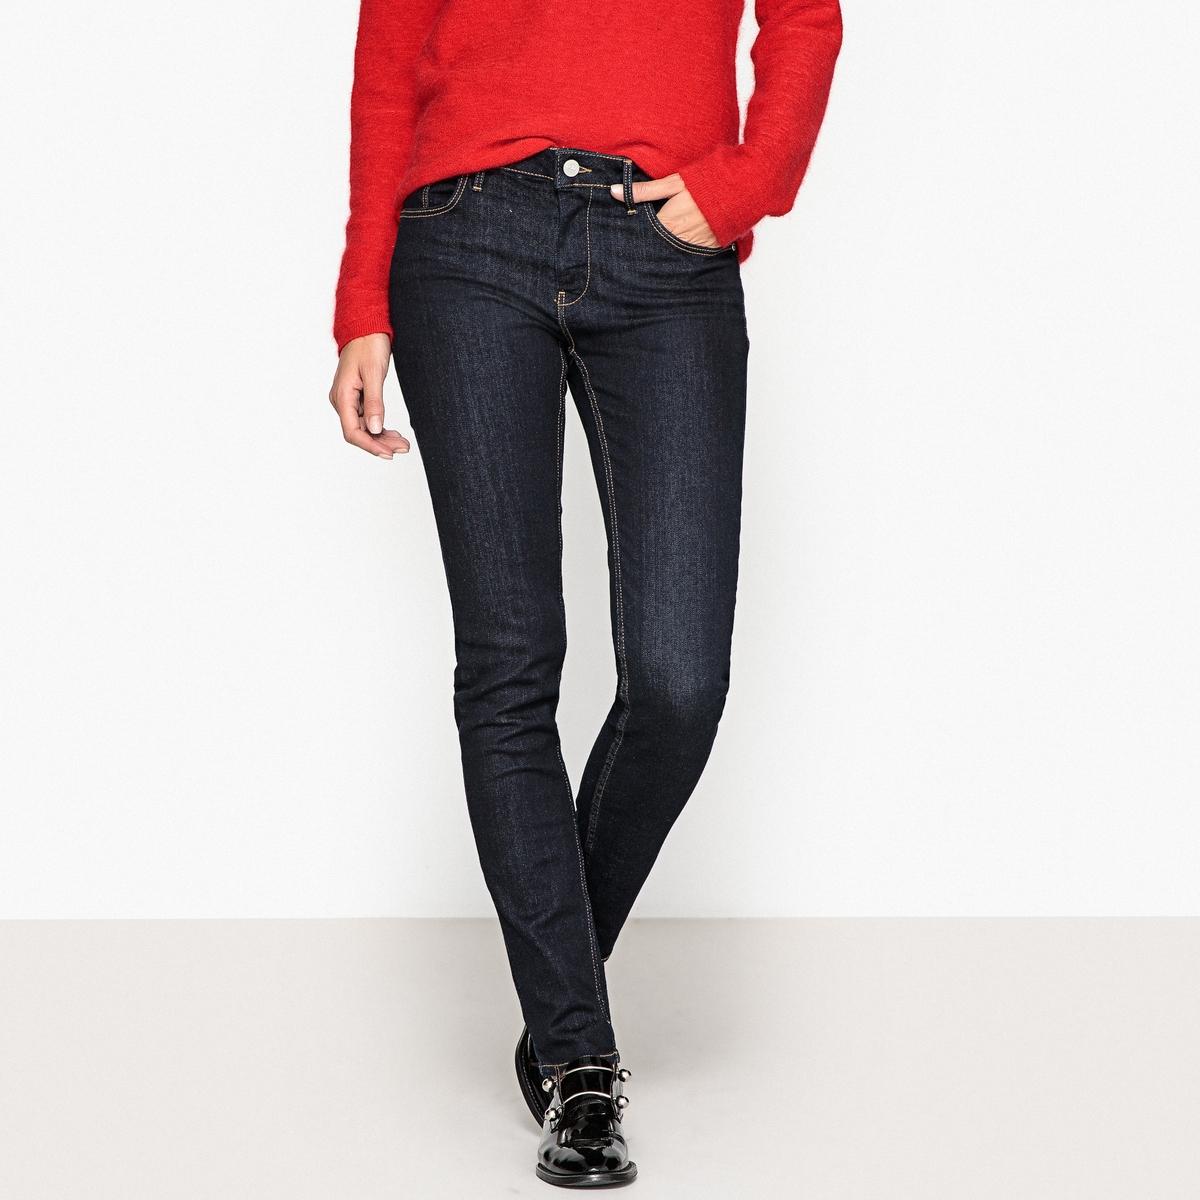 Джинсы узкие TEBO ostin узкие джинсы